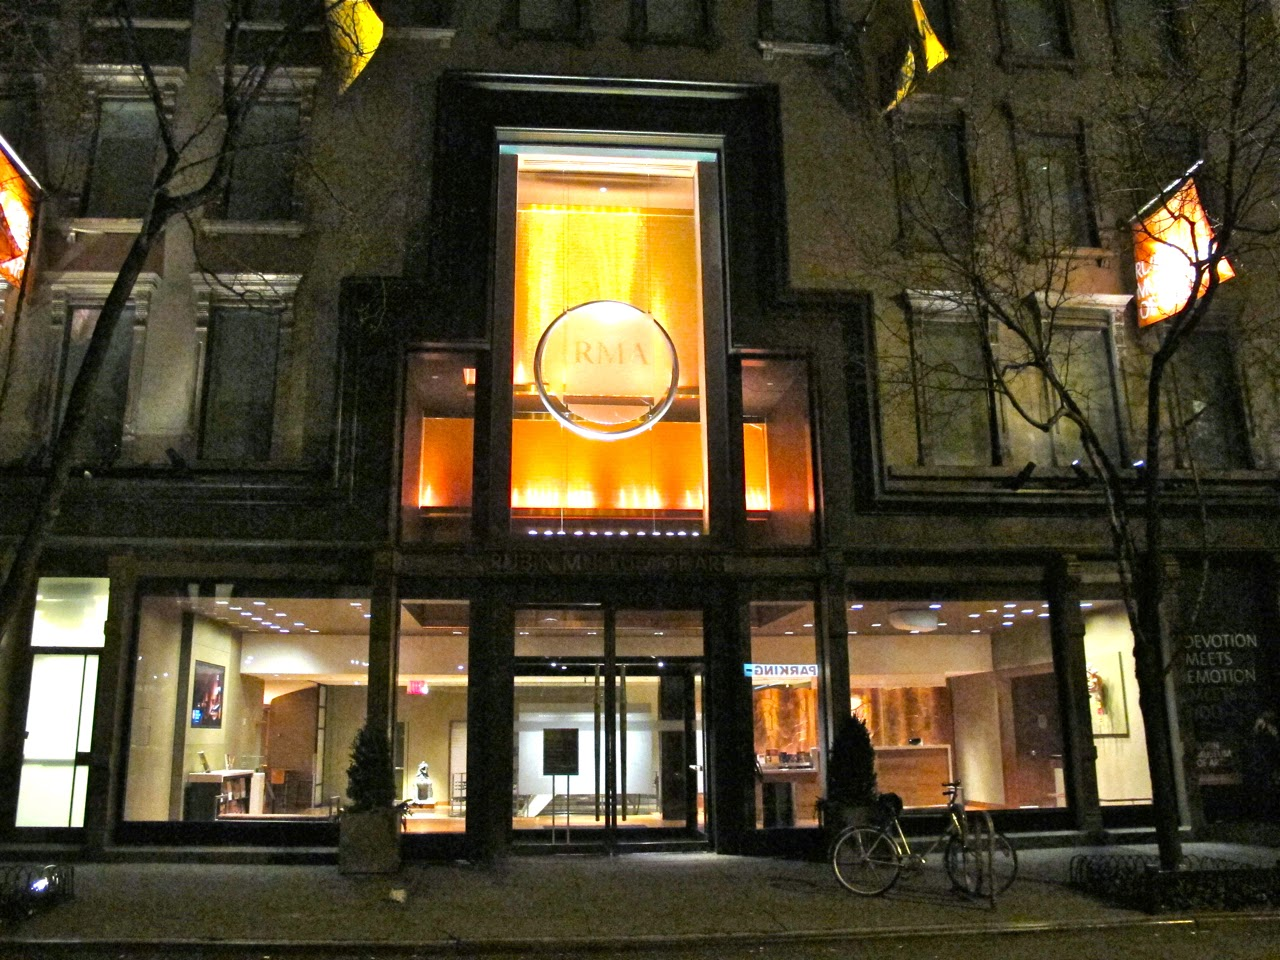 Rubin Museum of Art em Nova York